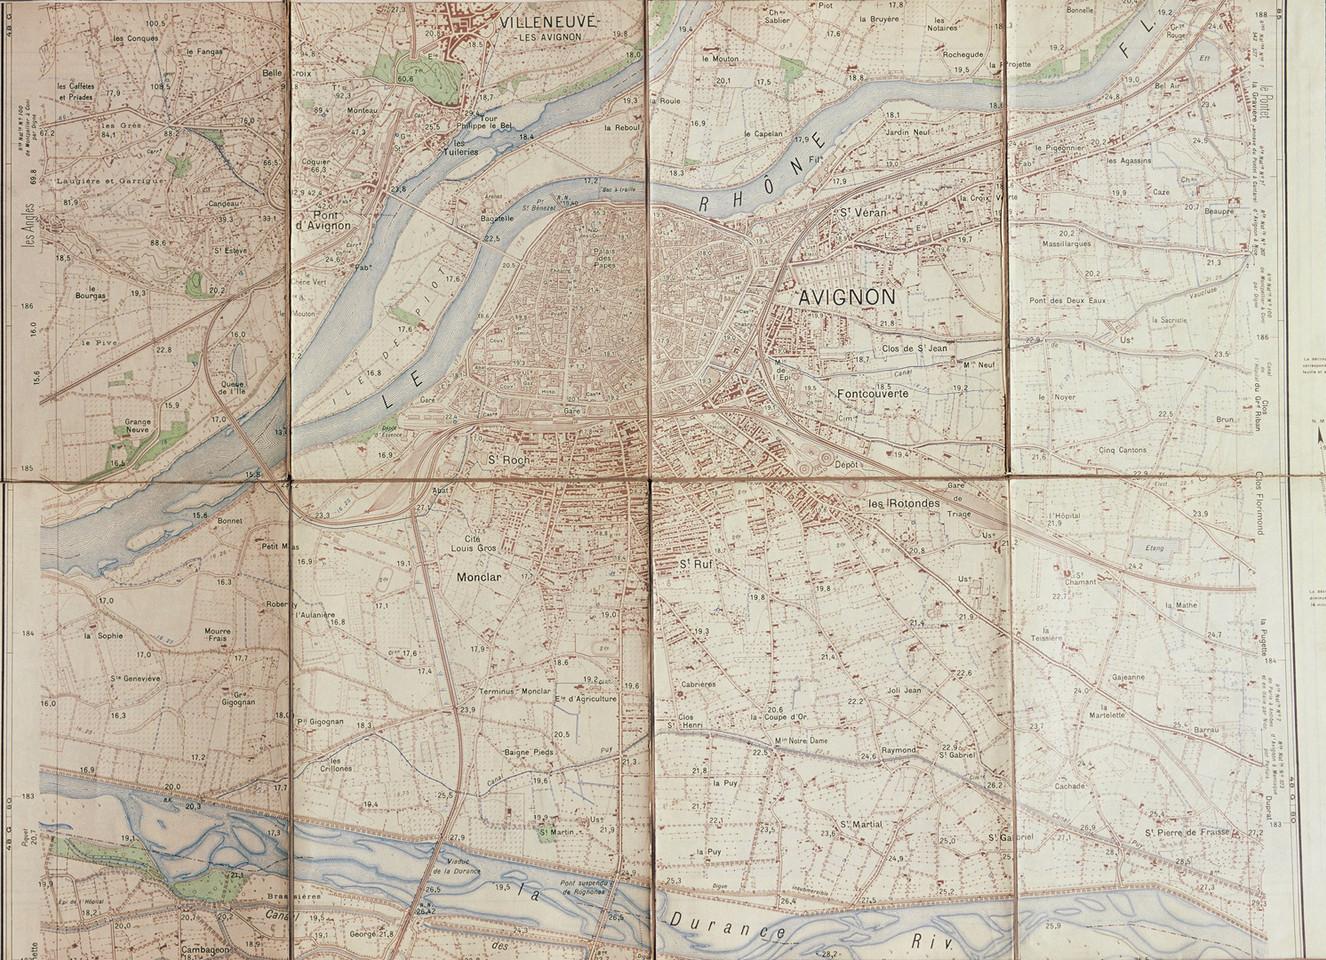 1950 – Avignon et son territoire